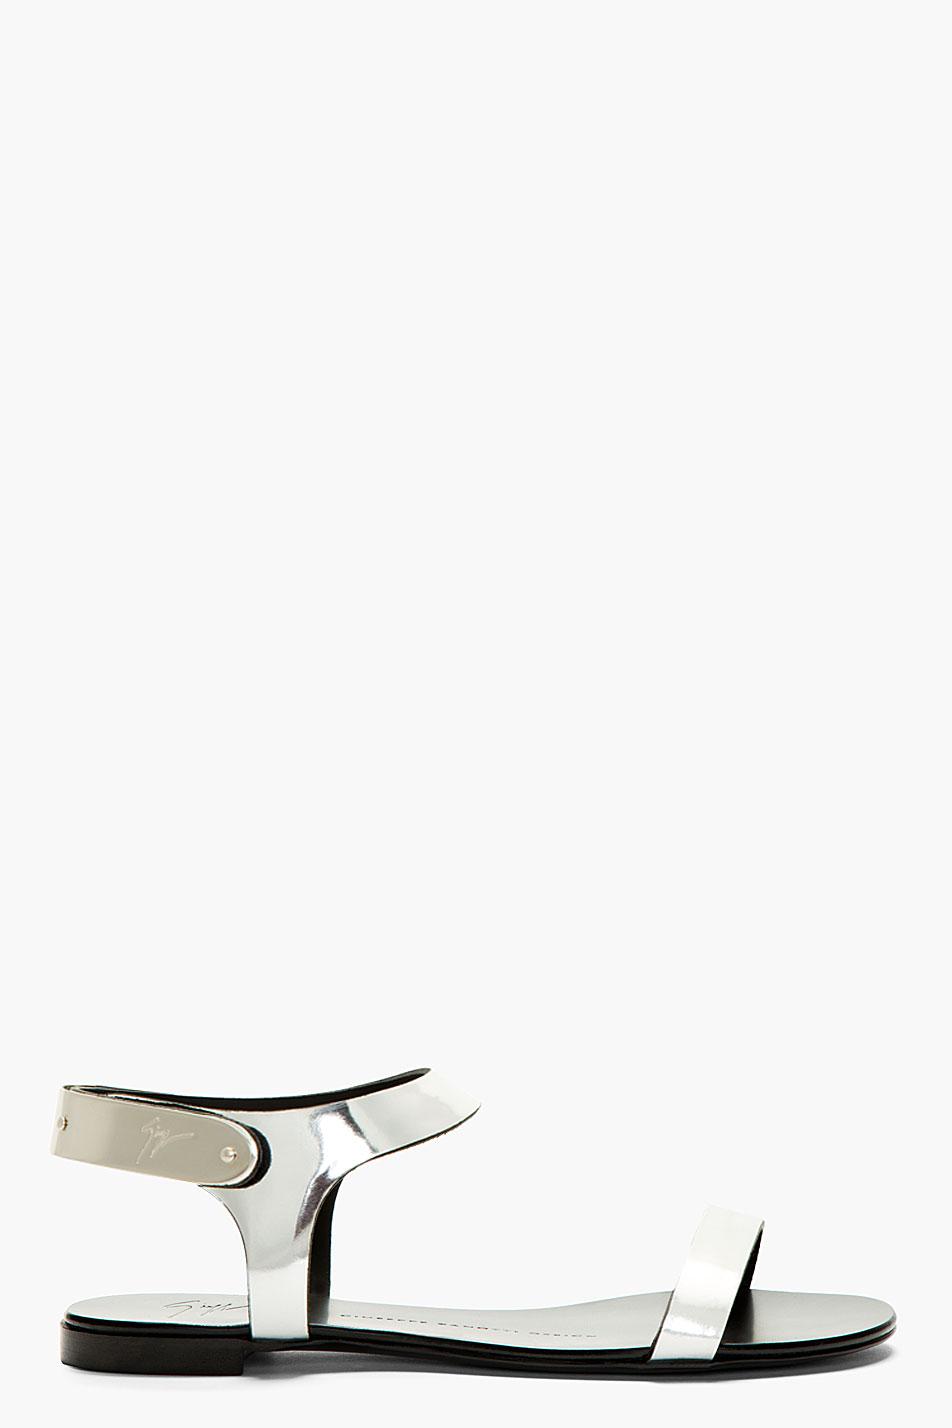 Giuseppe zanotti silver leather nuvoroll flat sandals